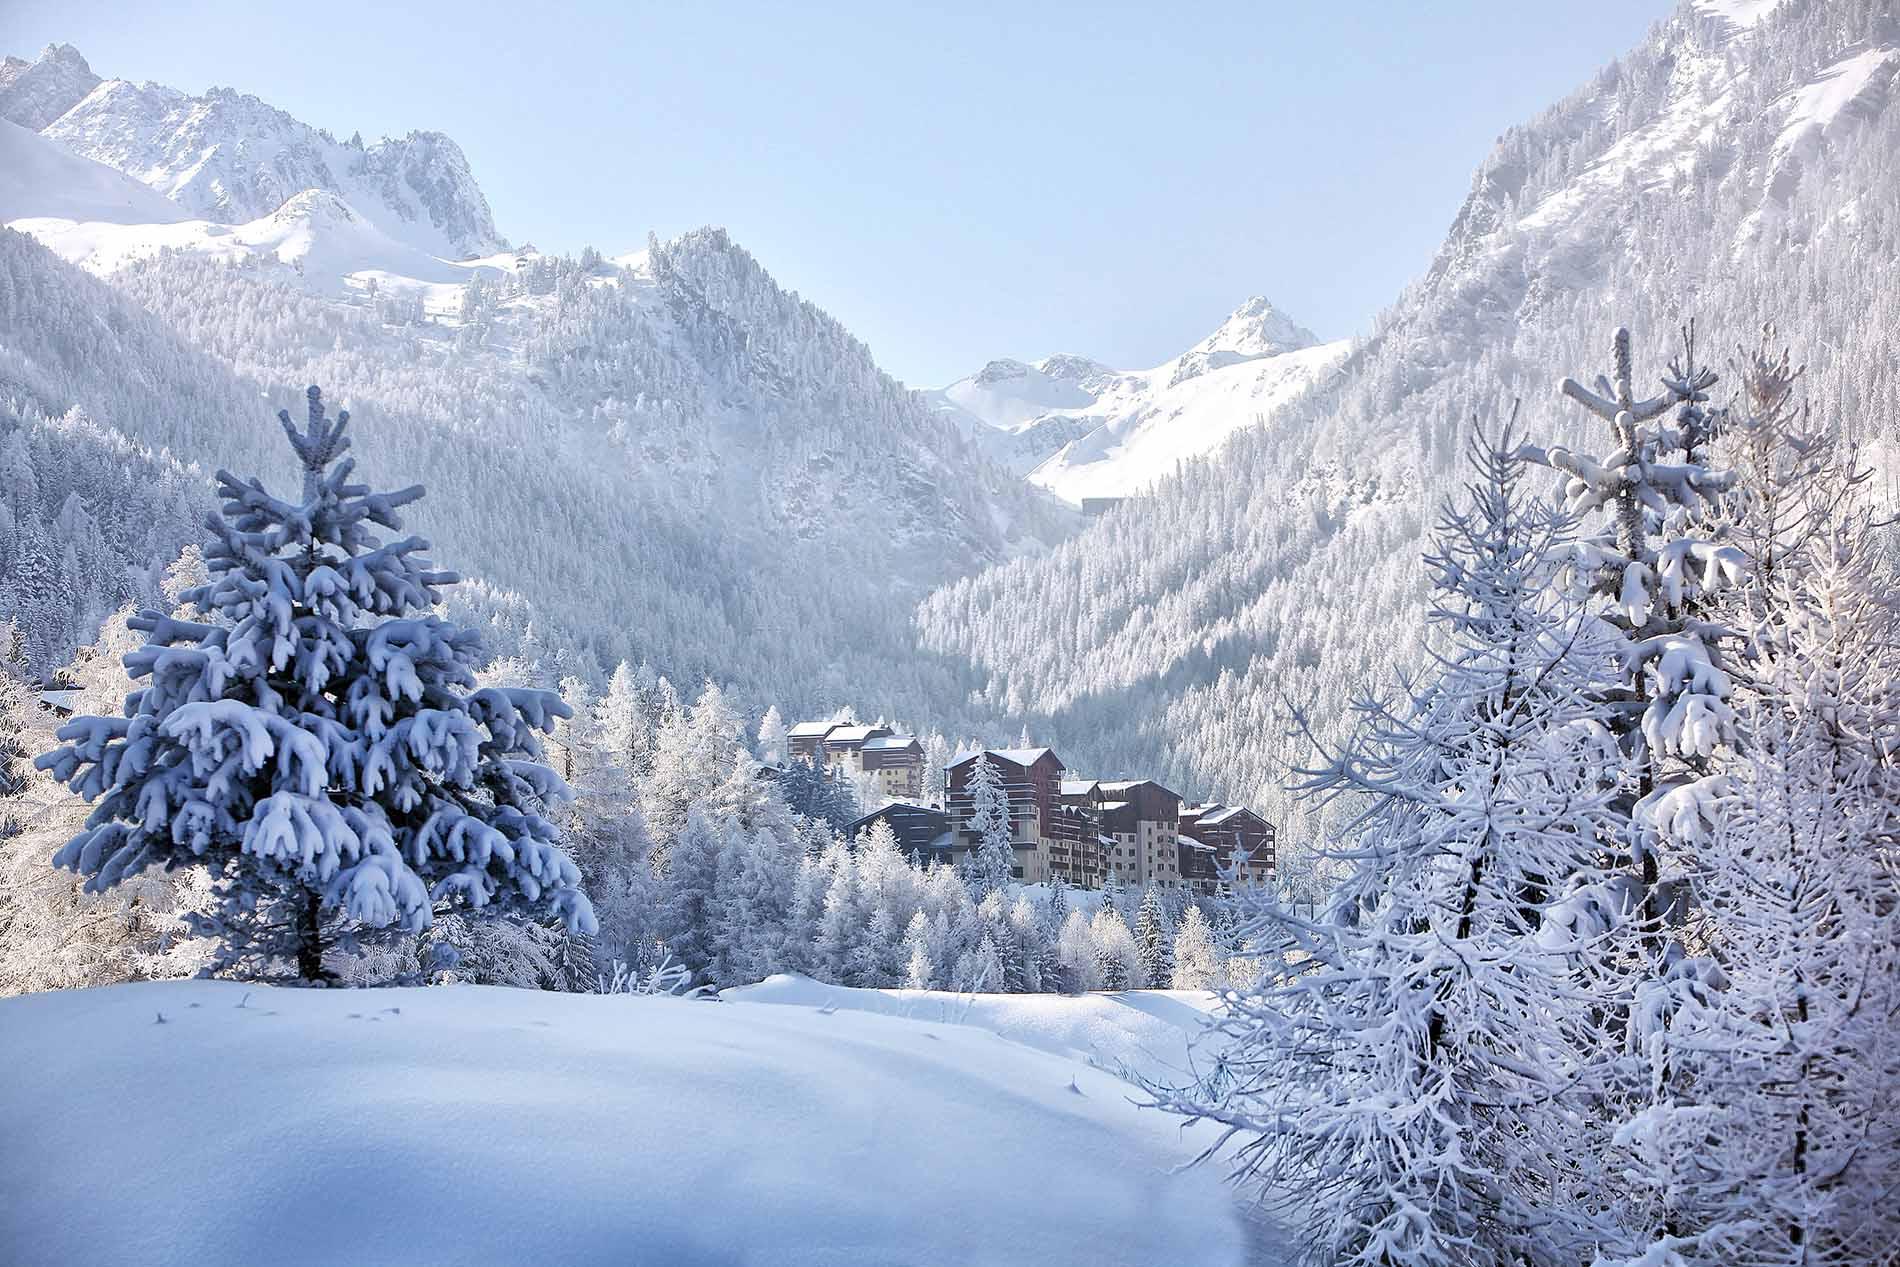 Location Valfrejus hiver